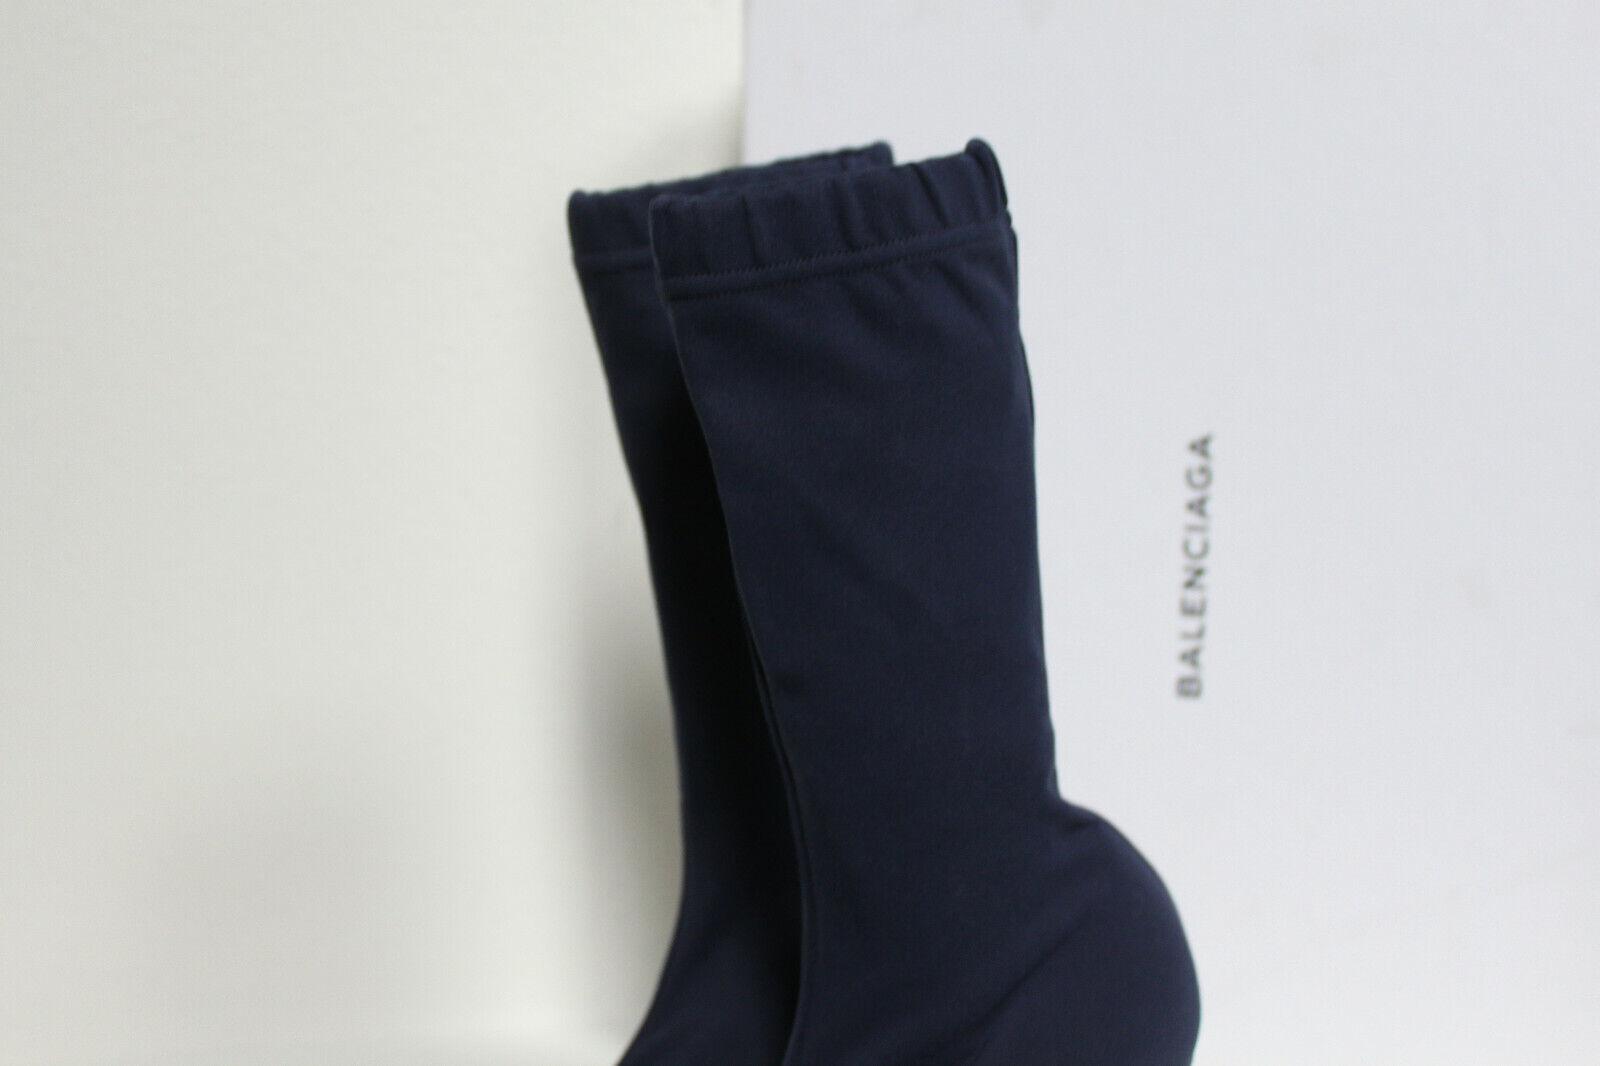 New sz 9.5     40 Balenciaga Knife Stretch Navy Fabric Pointed Toe Stiefel Heel schuhe 3db079